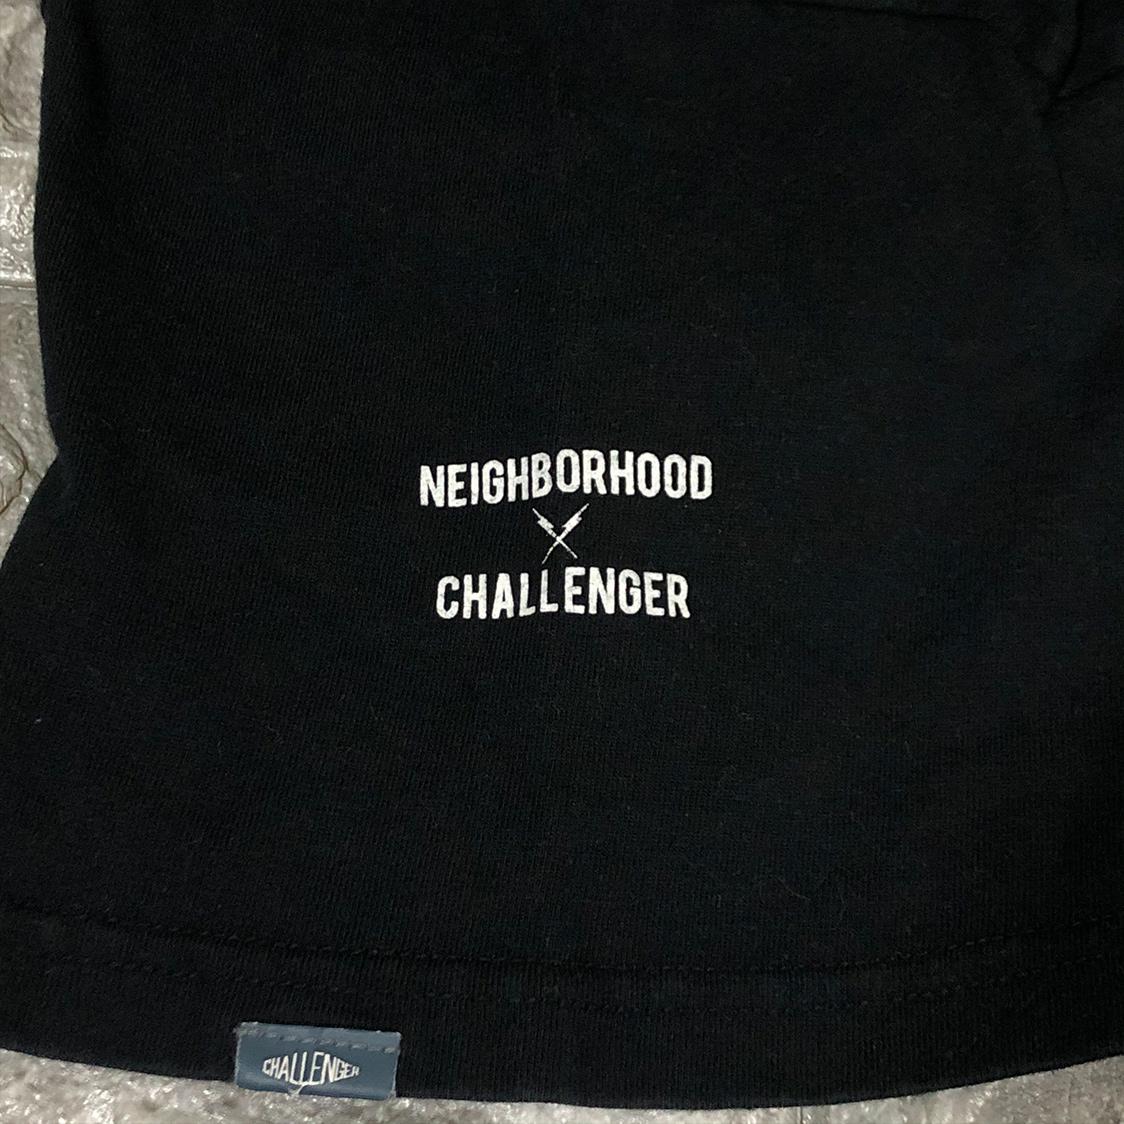 NEIGHBORHOOD ネイバーフッド × CHALLENGER チャレンジャー 【Sサイズ】 半袖 Tシャツ ブラック カットソー